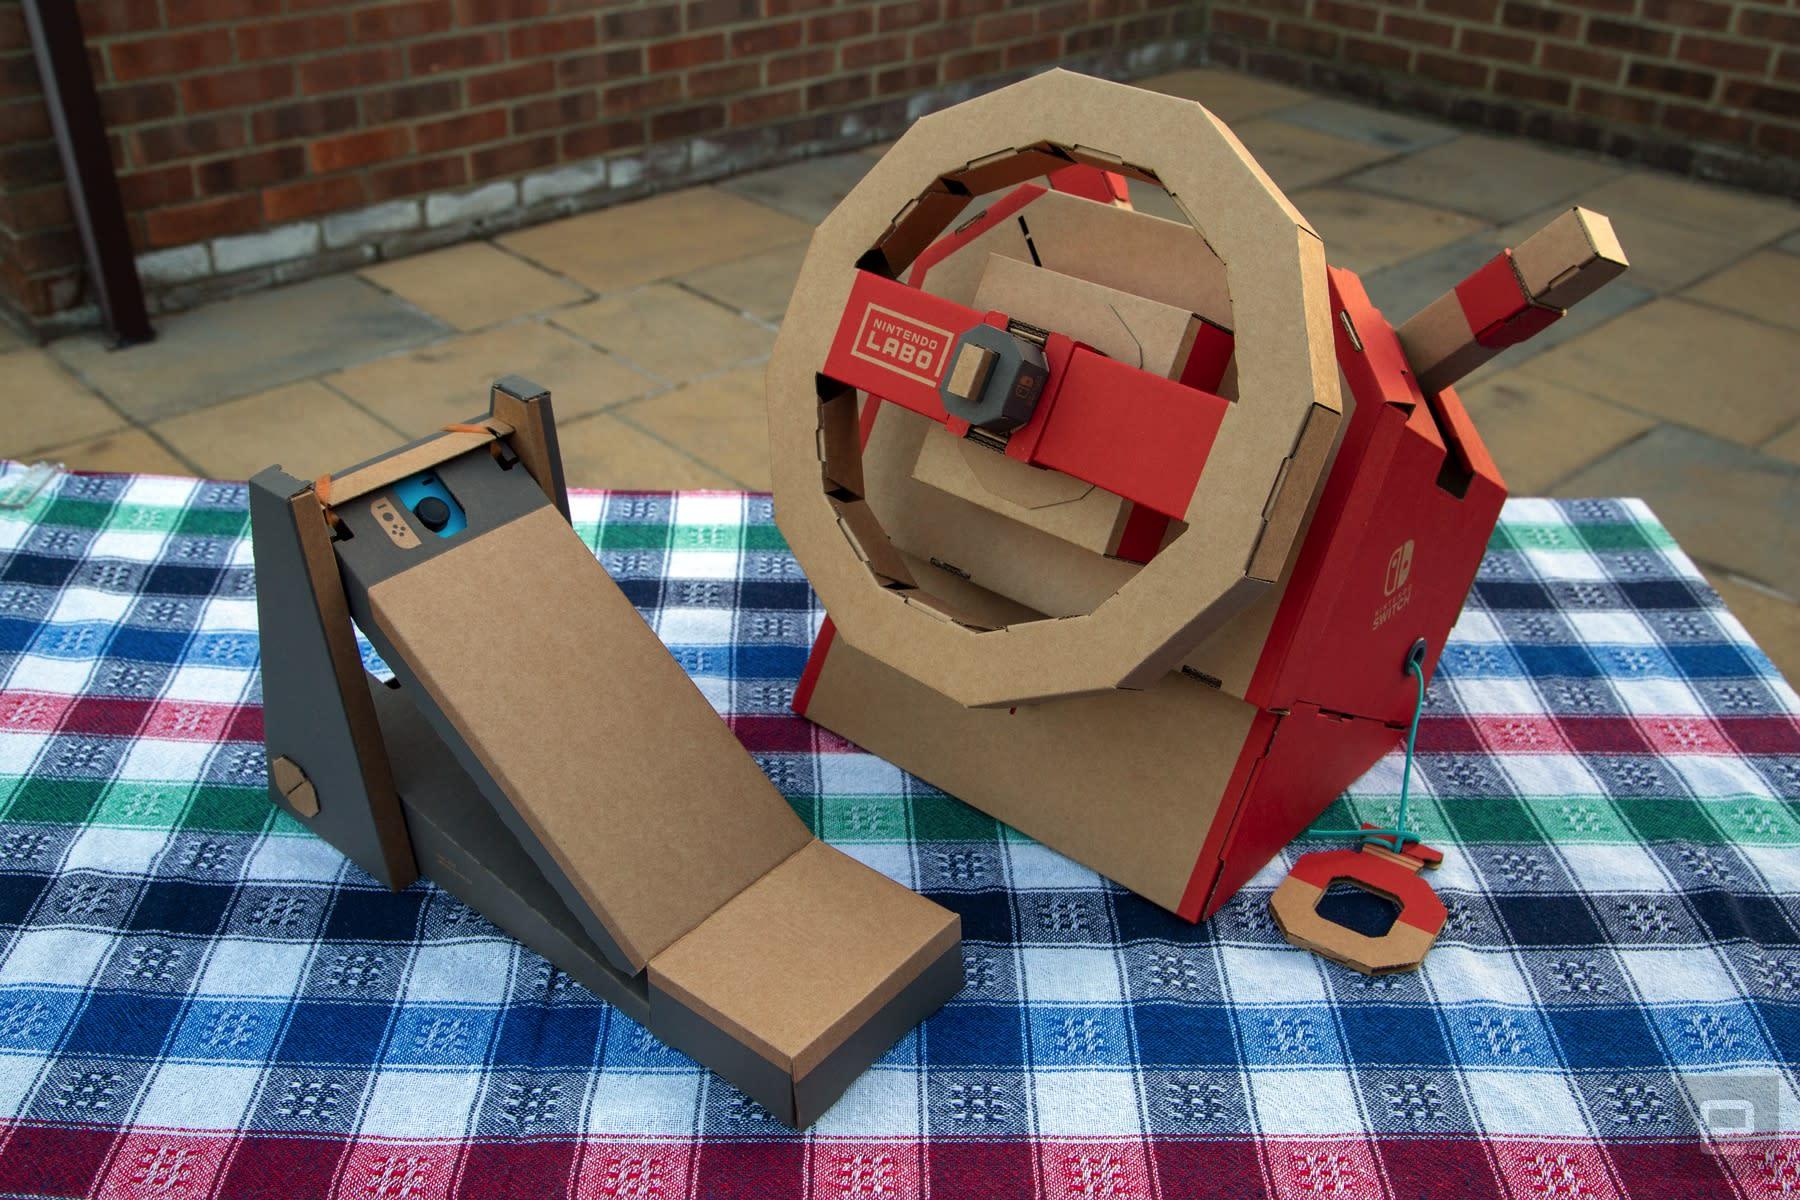 Nintendo Labo Vehicle Kit: Rewarding builds with better games